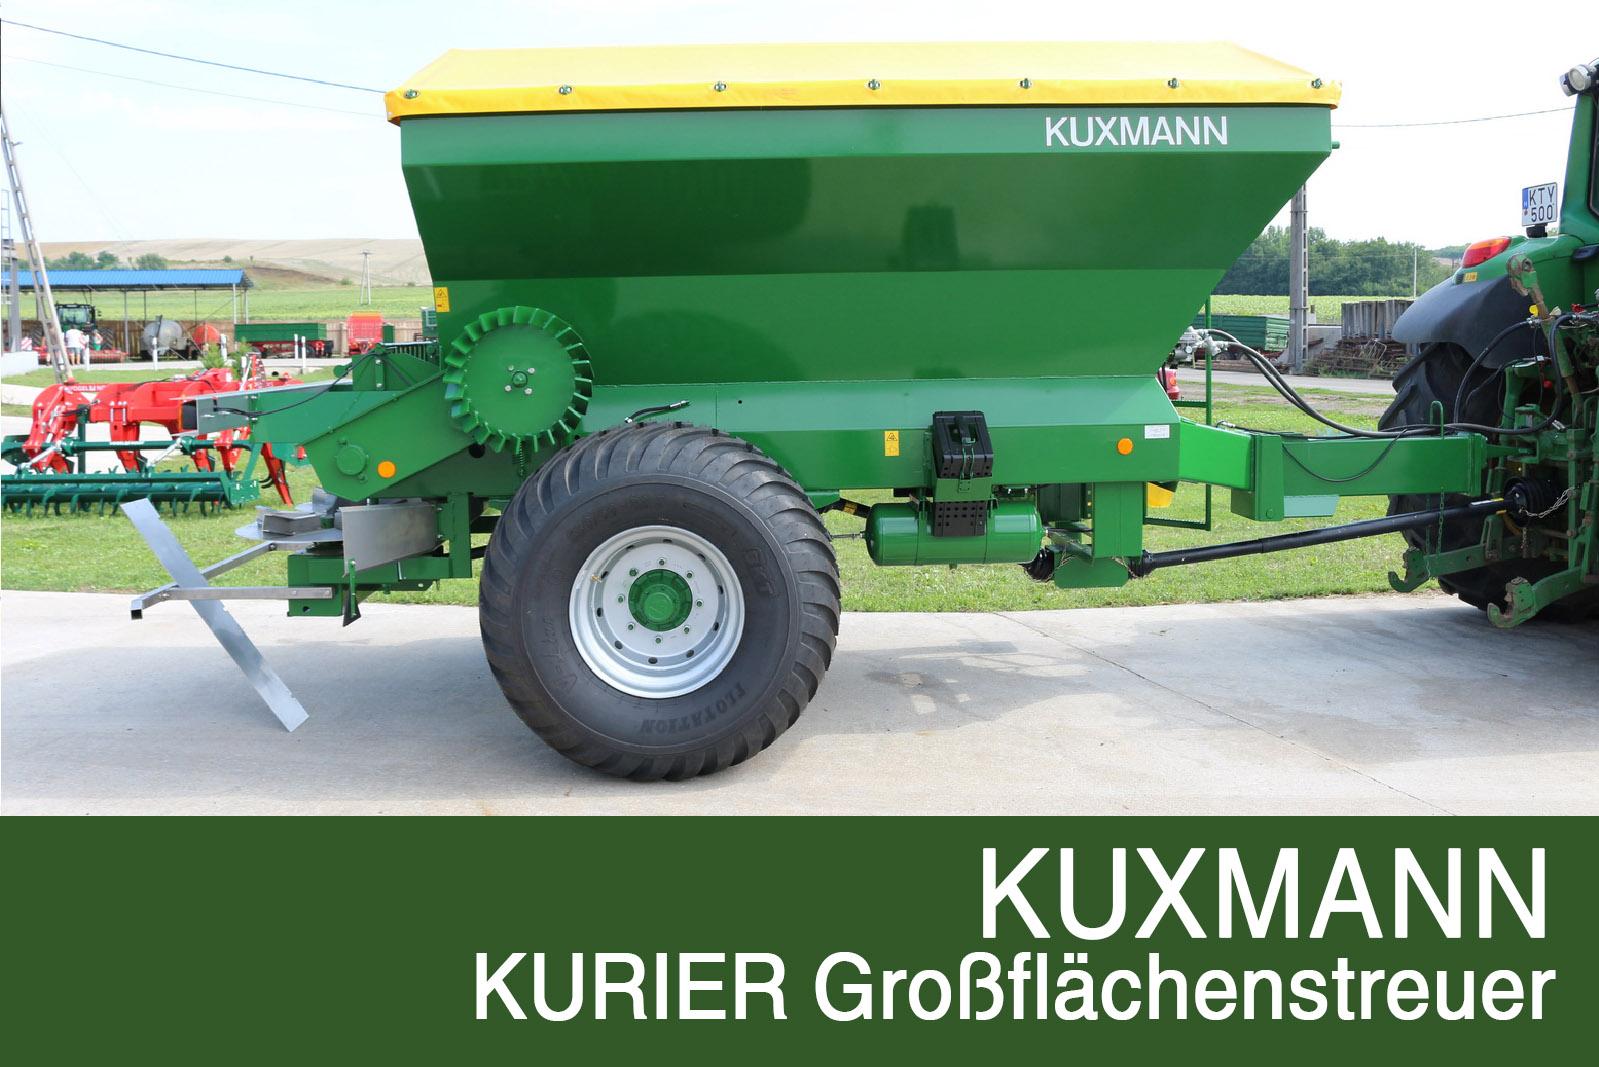 KUXMANN KURIER Large-area spreader